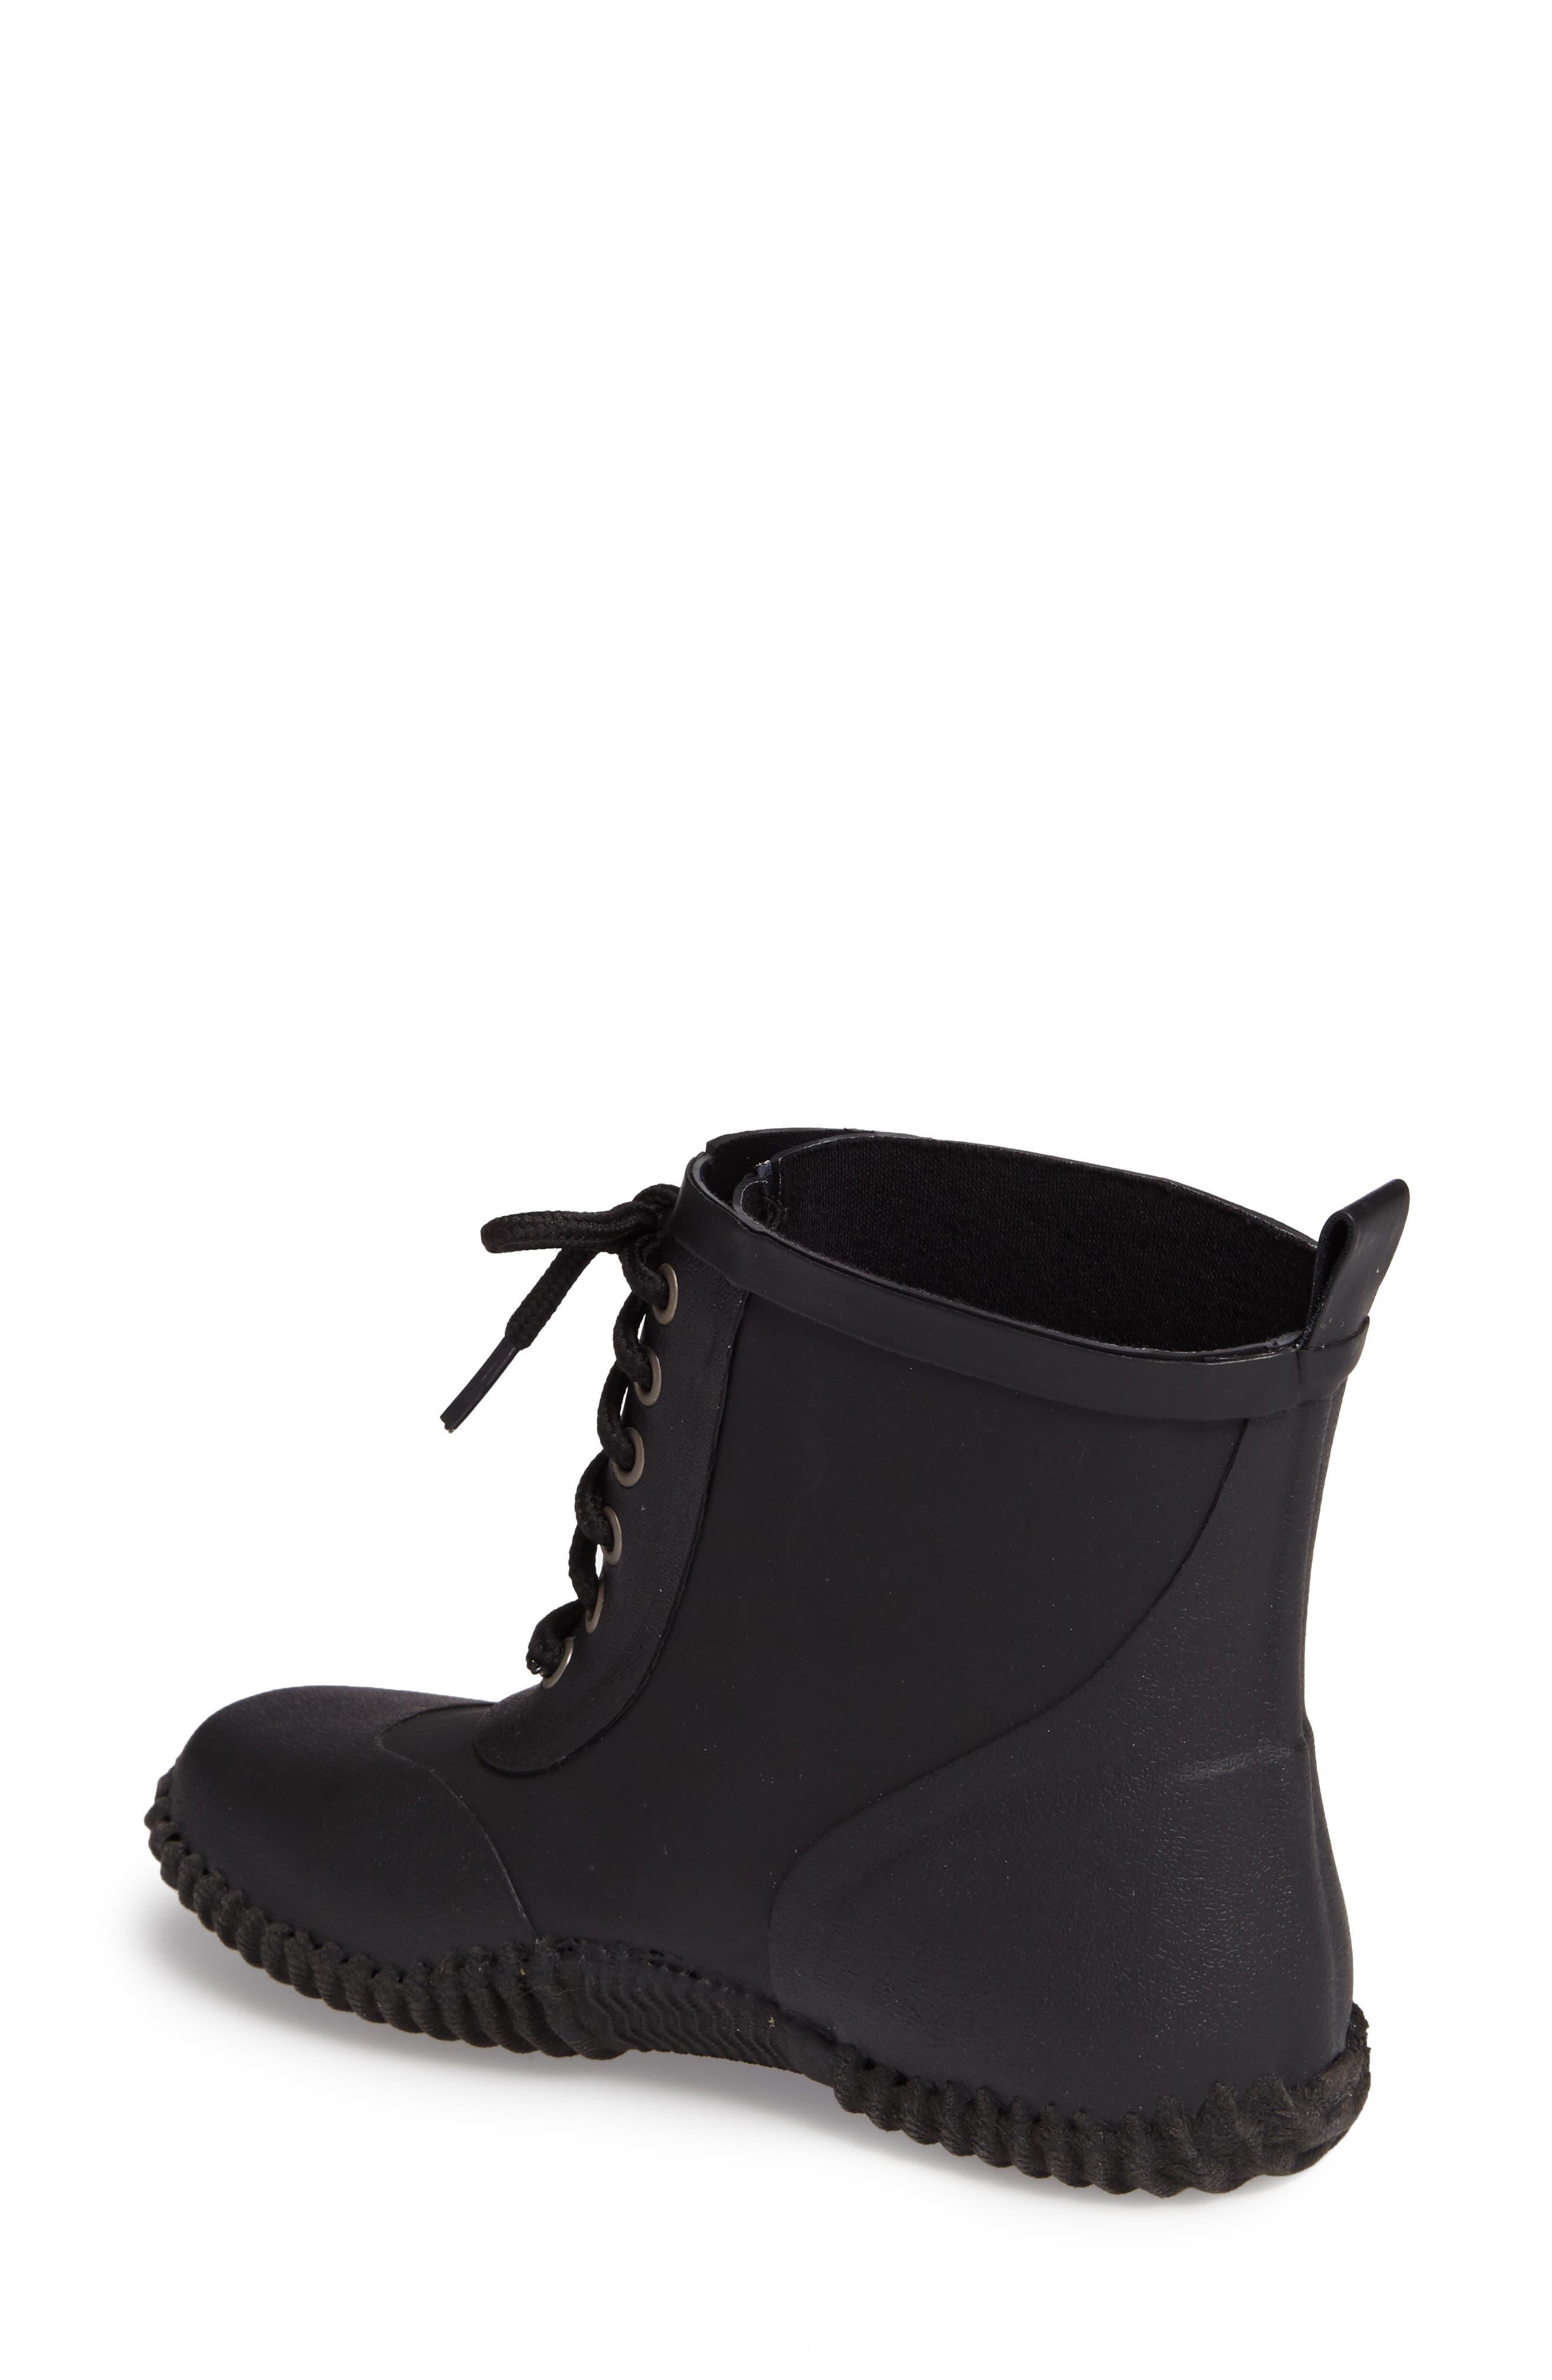 DÄV, Telluride Waterproof Rain Boot, Alternate thumbnail 2, color, BLACK